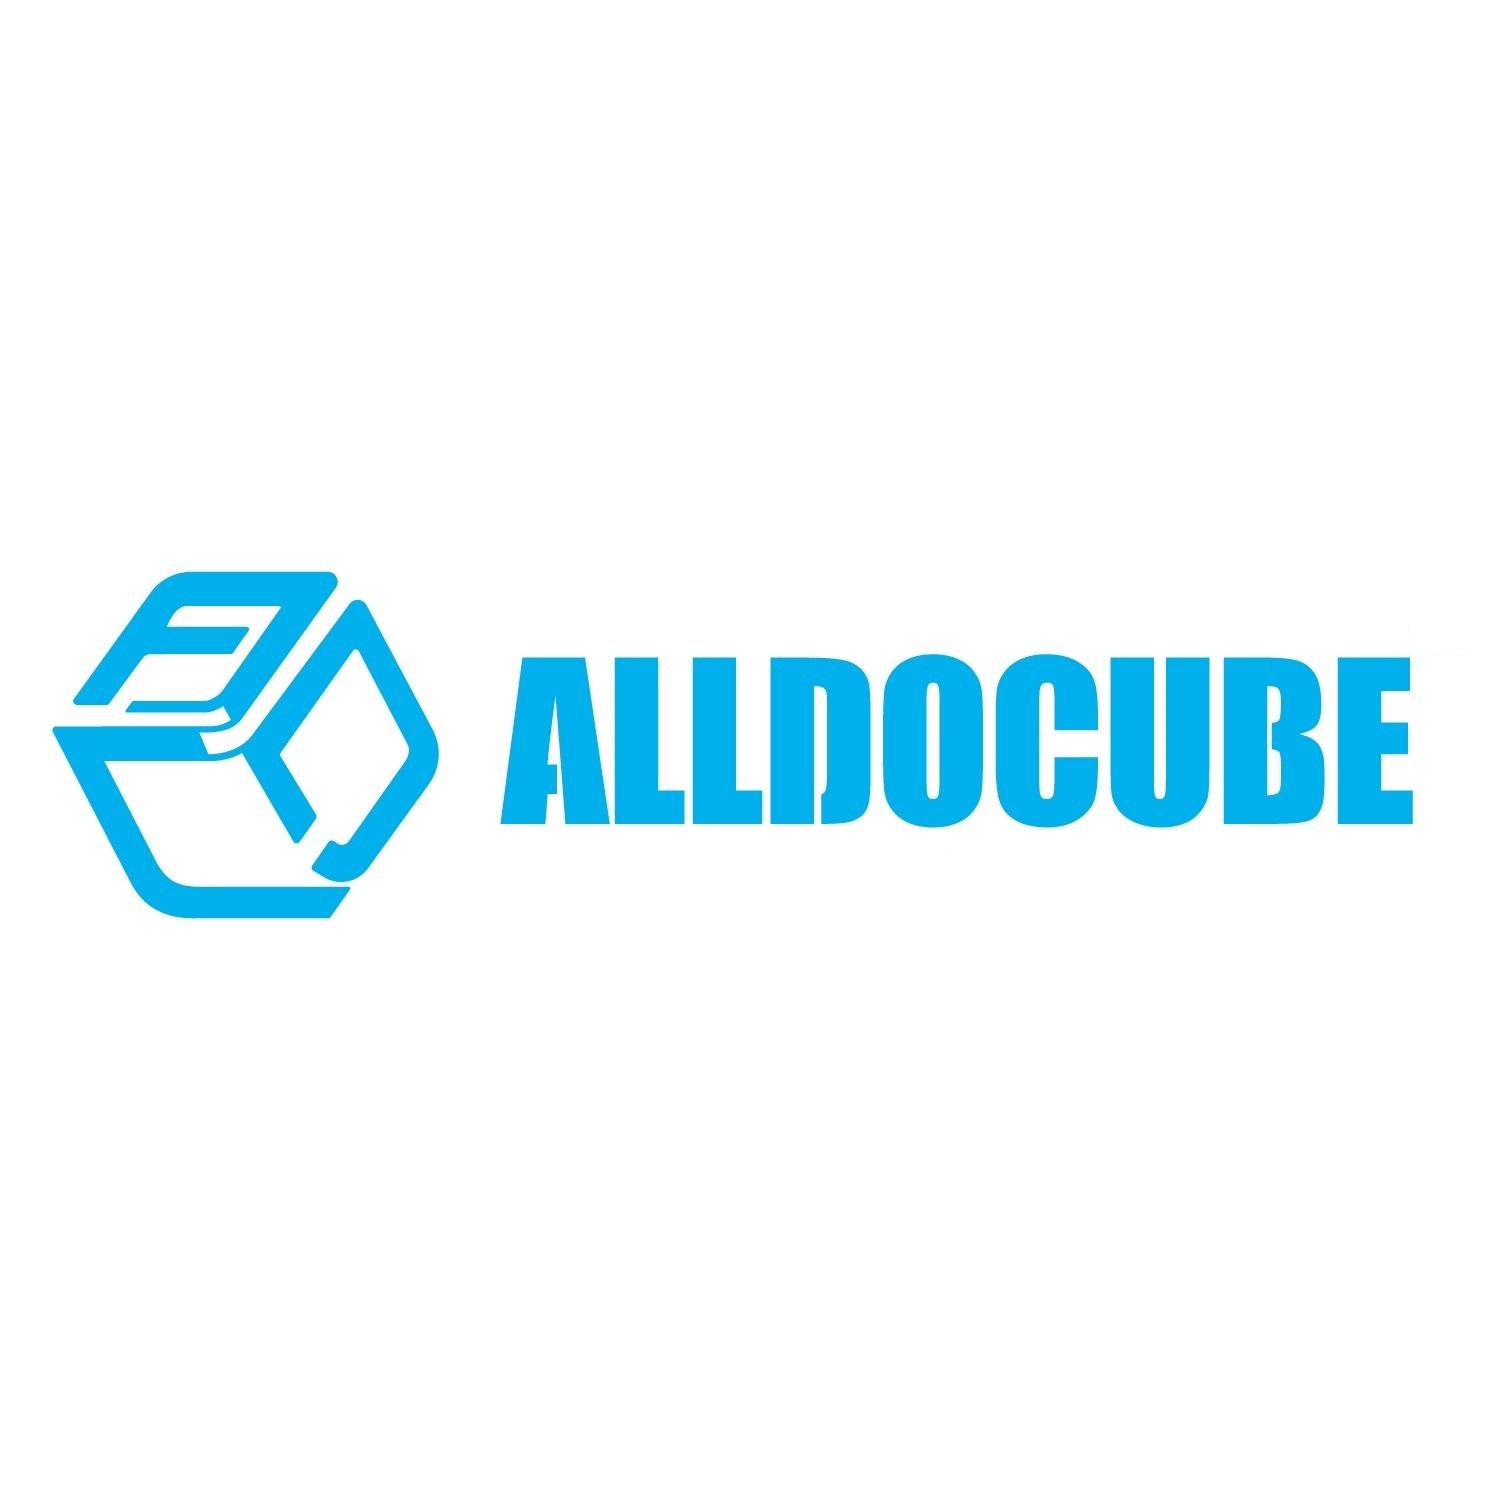 Alldocube ukázalo tablety iPlay10 Pro a iPlay8 Pro